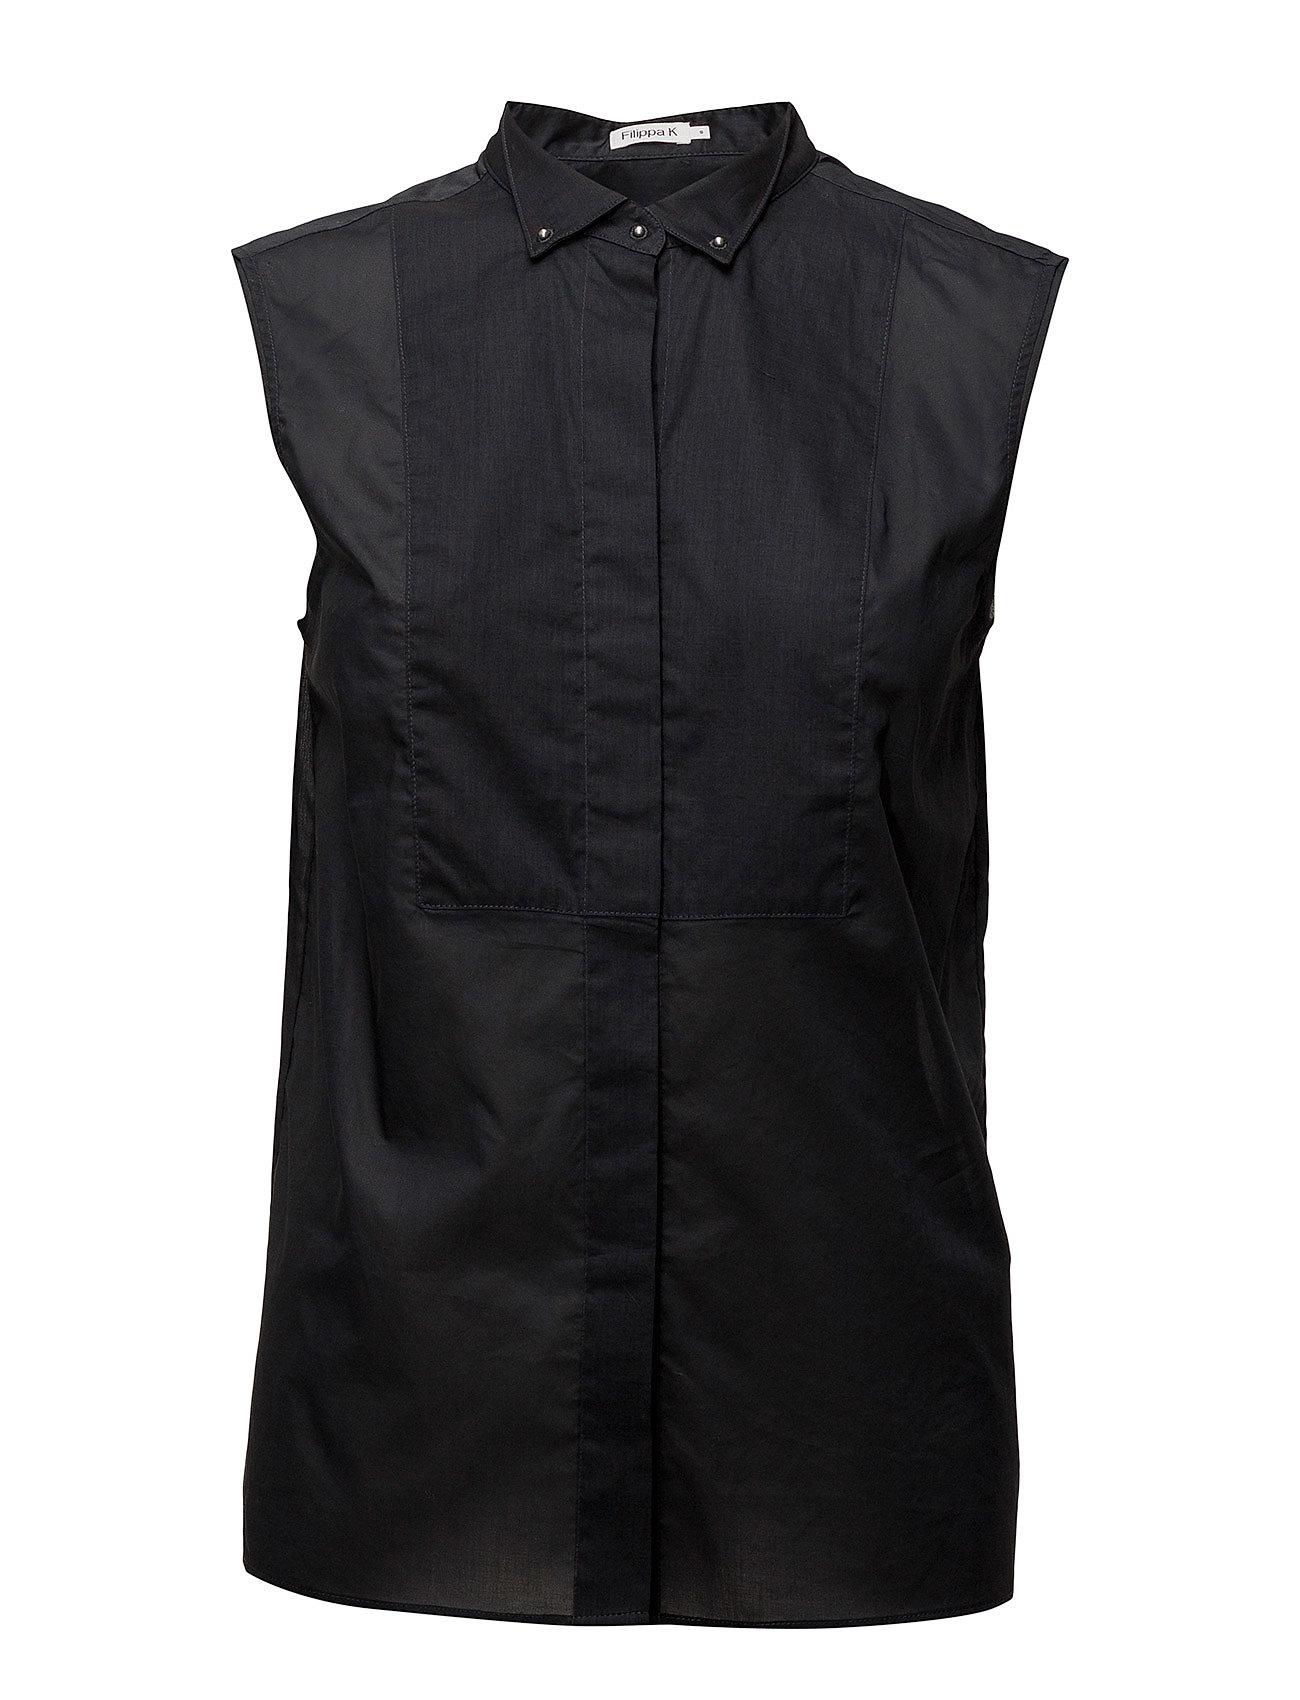 Filippa K Tuxedo Sleeveless shirt Ögrönlar